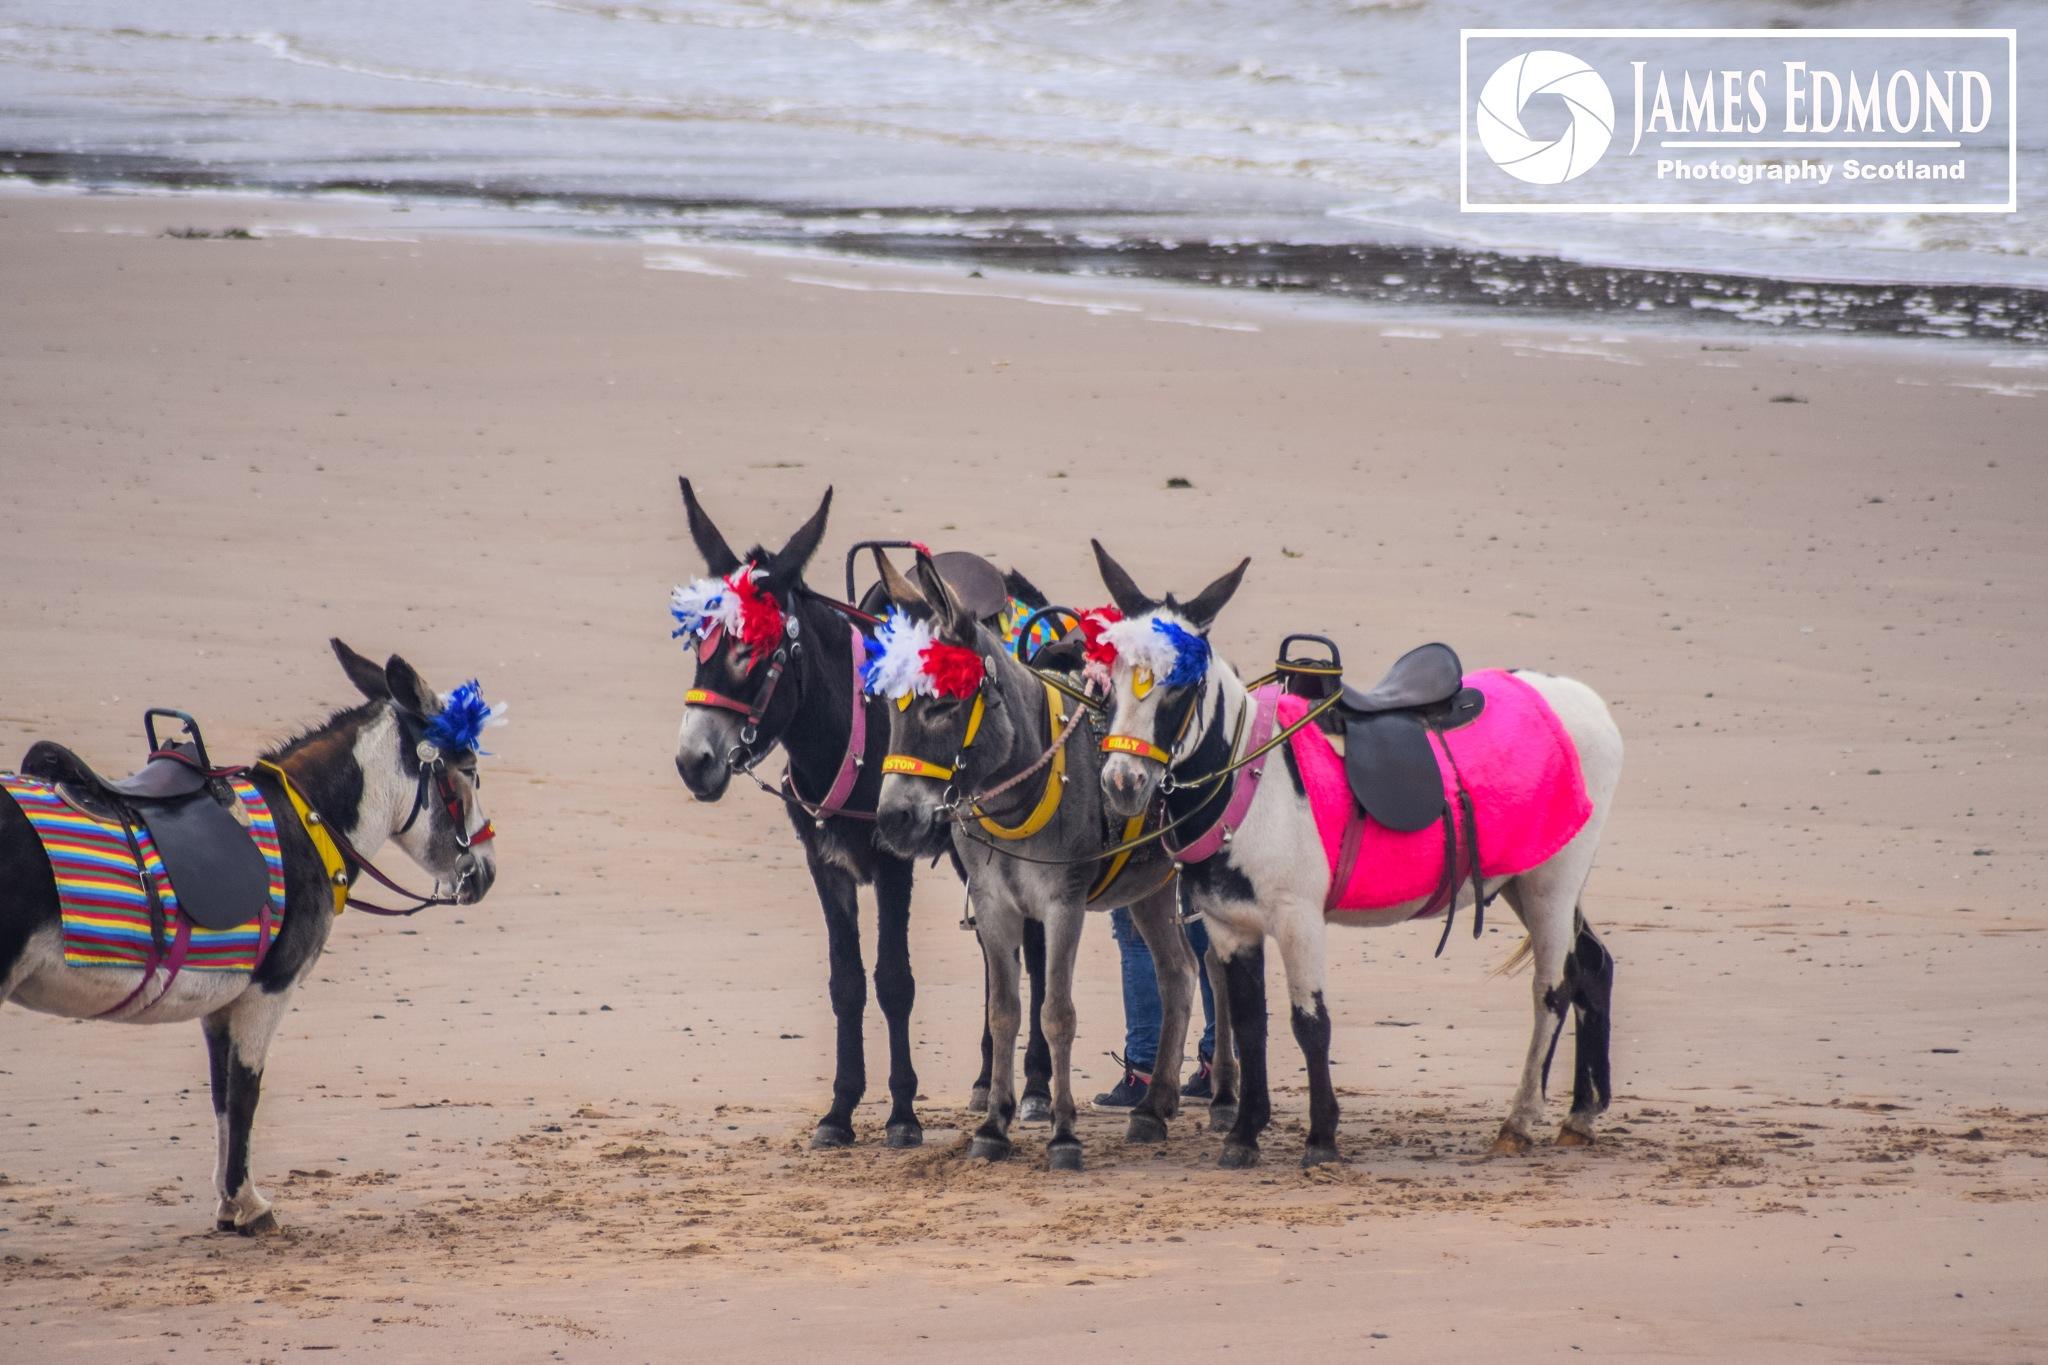 Colourful Donkeys by James Edmond Photography